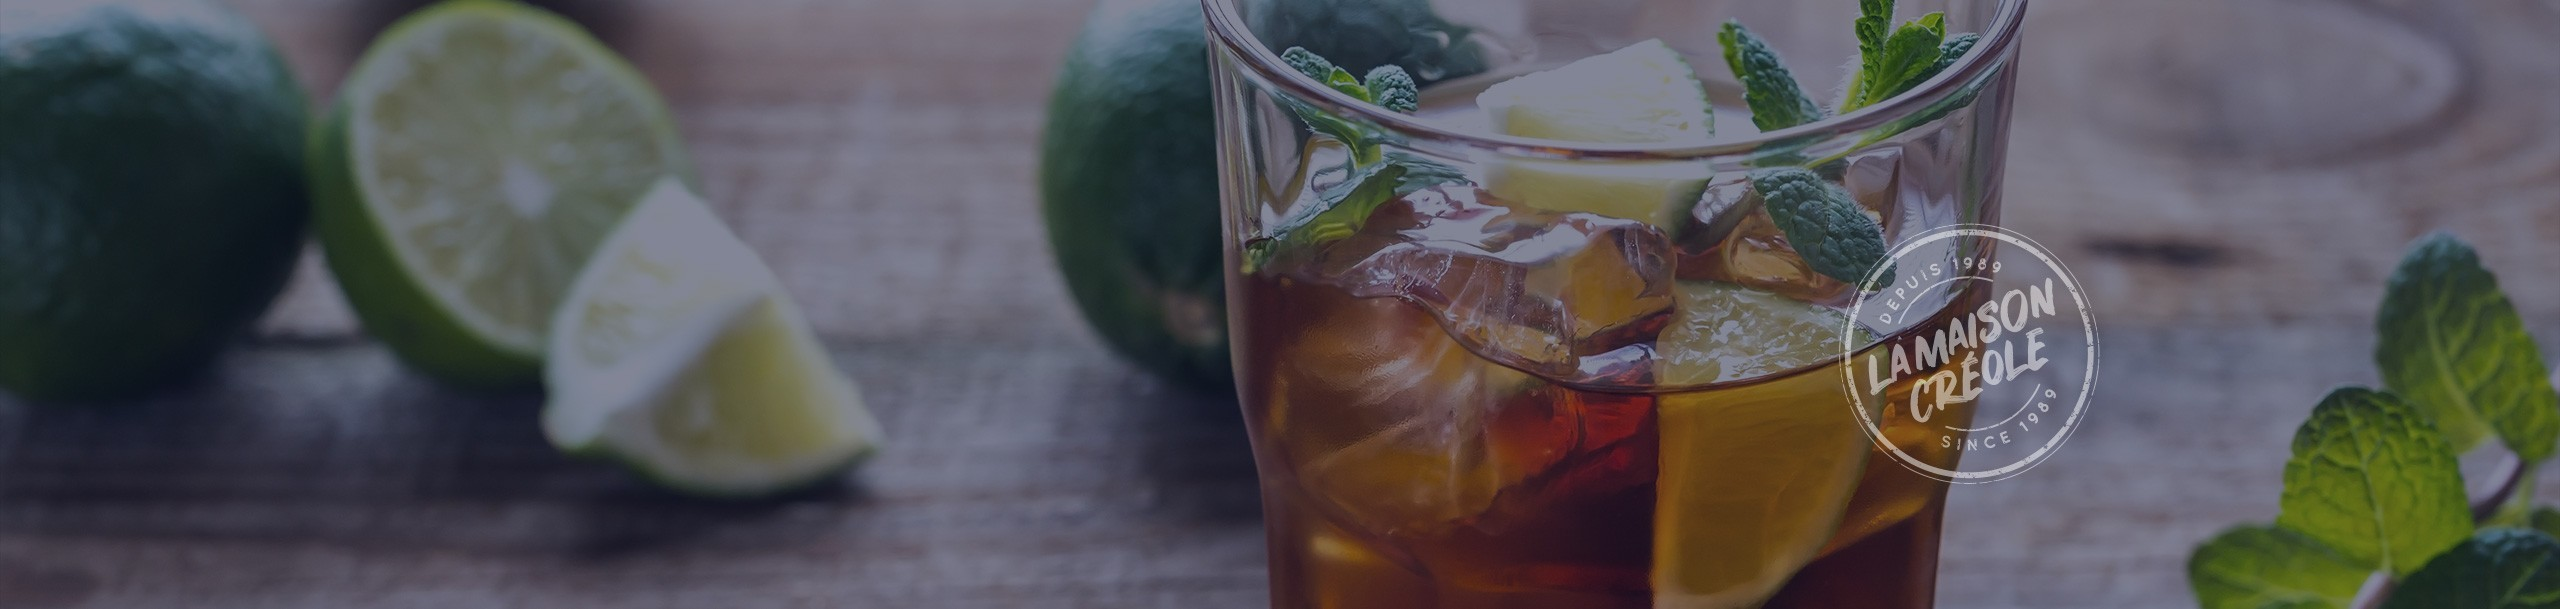 Old rum